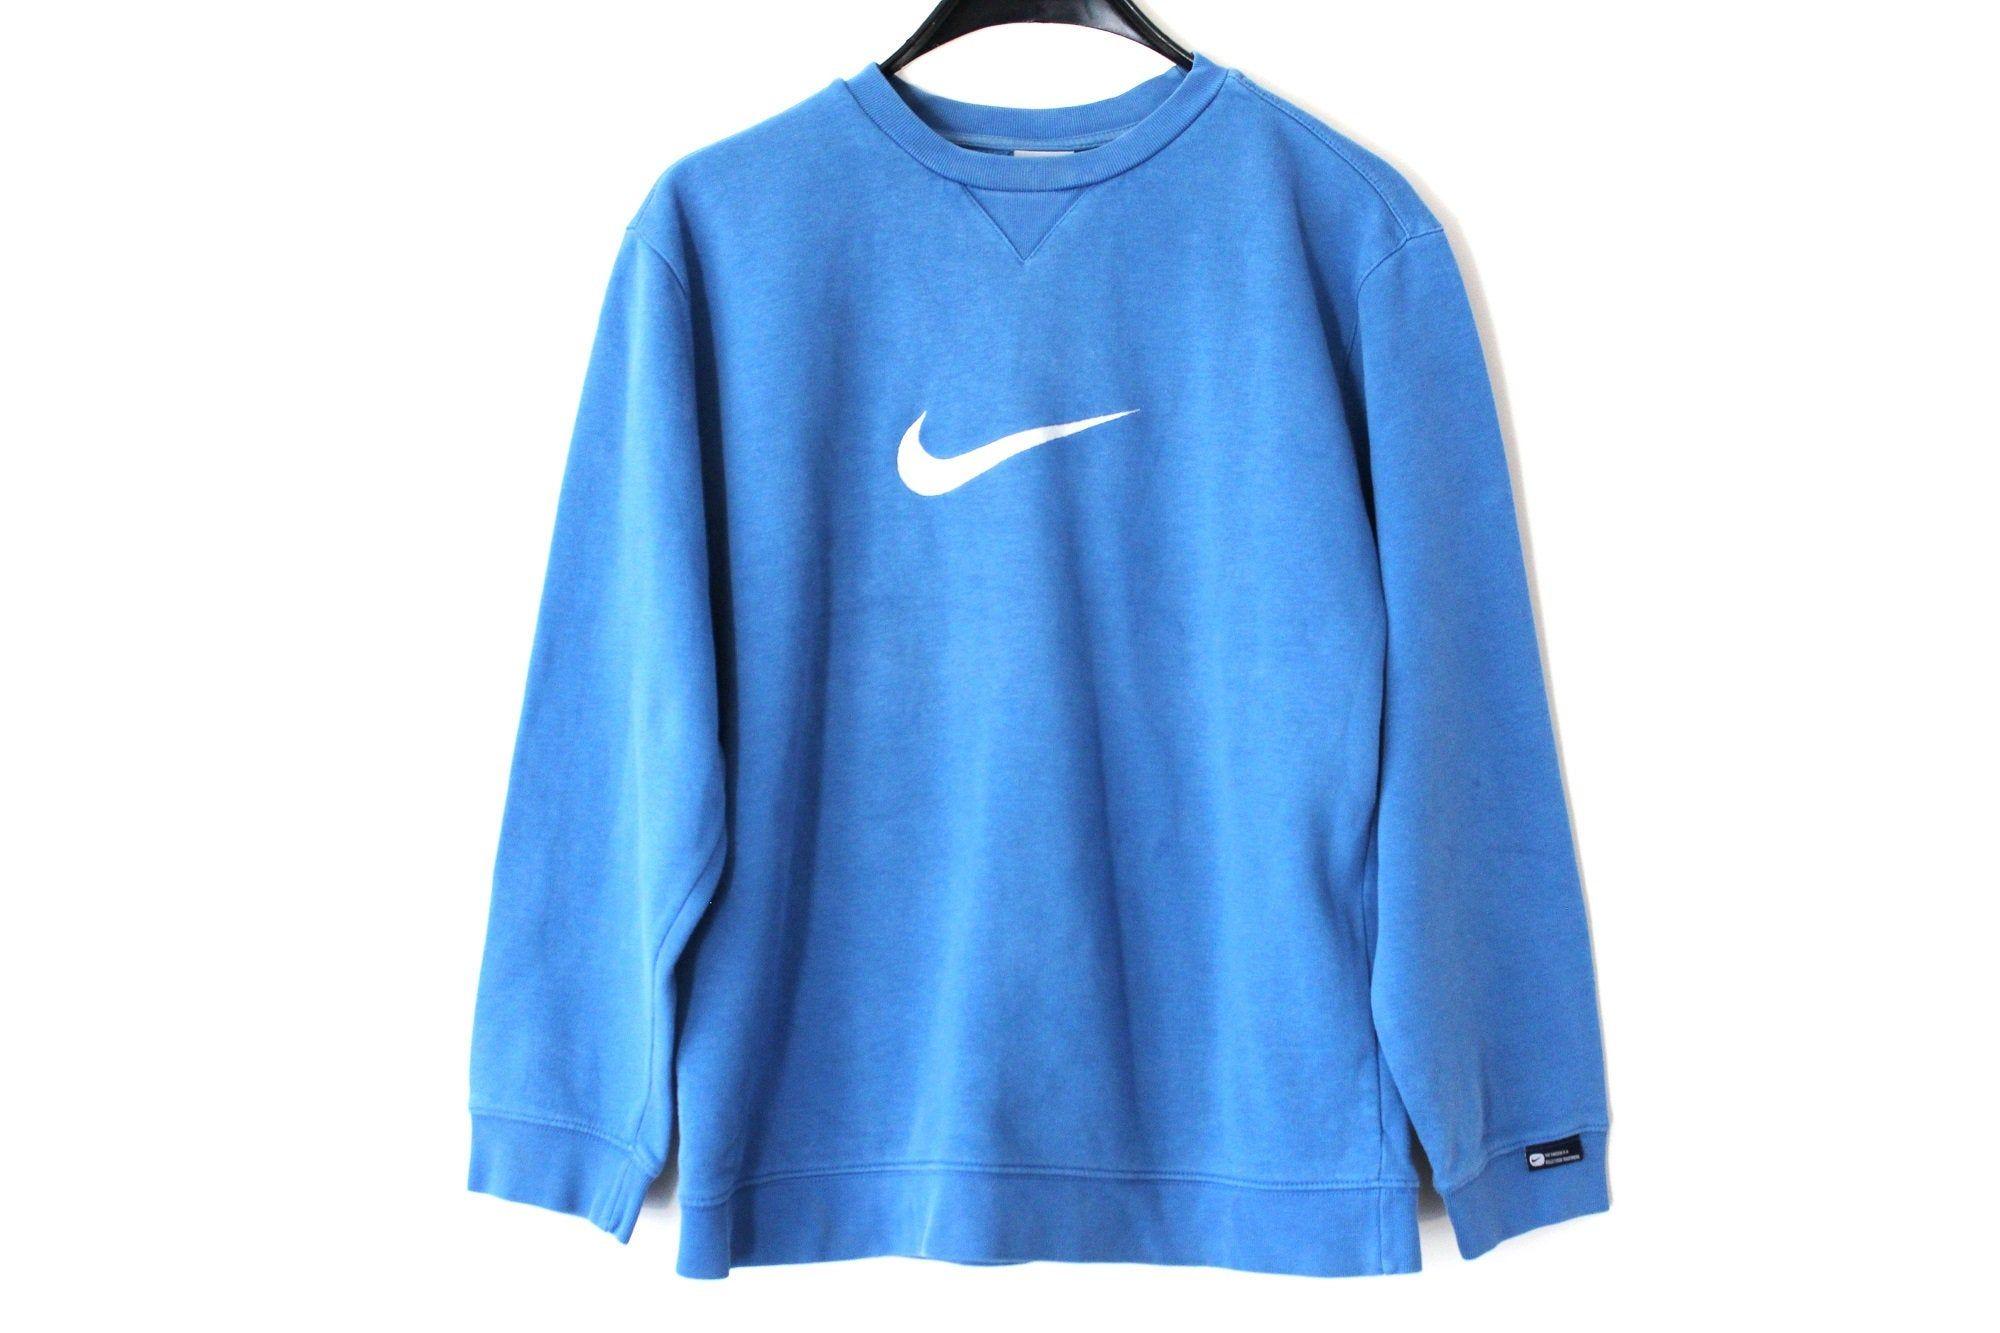 Pino Estimar Monje  Blue Nike Sweatshirt Vintage Nike Jumper Nike Swoosh Nike Pullover Nike  Sweater Hip Hop Streetwear Nike Athletic Sp… | Nike pullover, Nike track  jacket, Sweatshirts